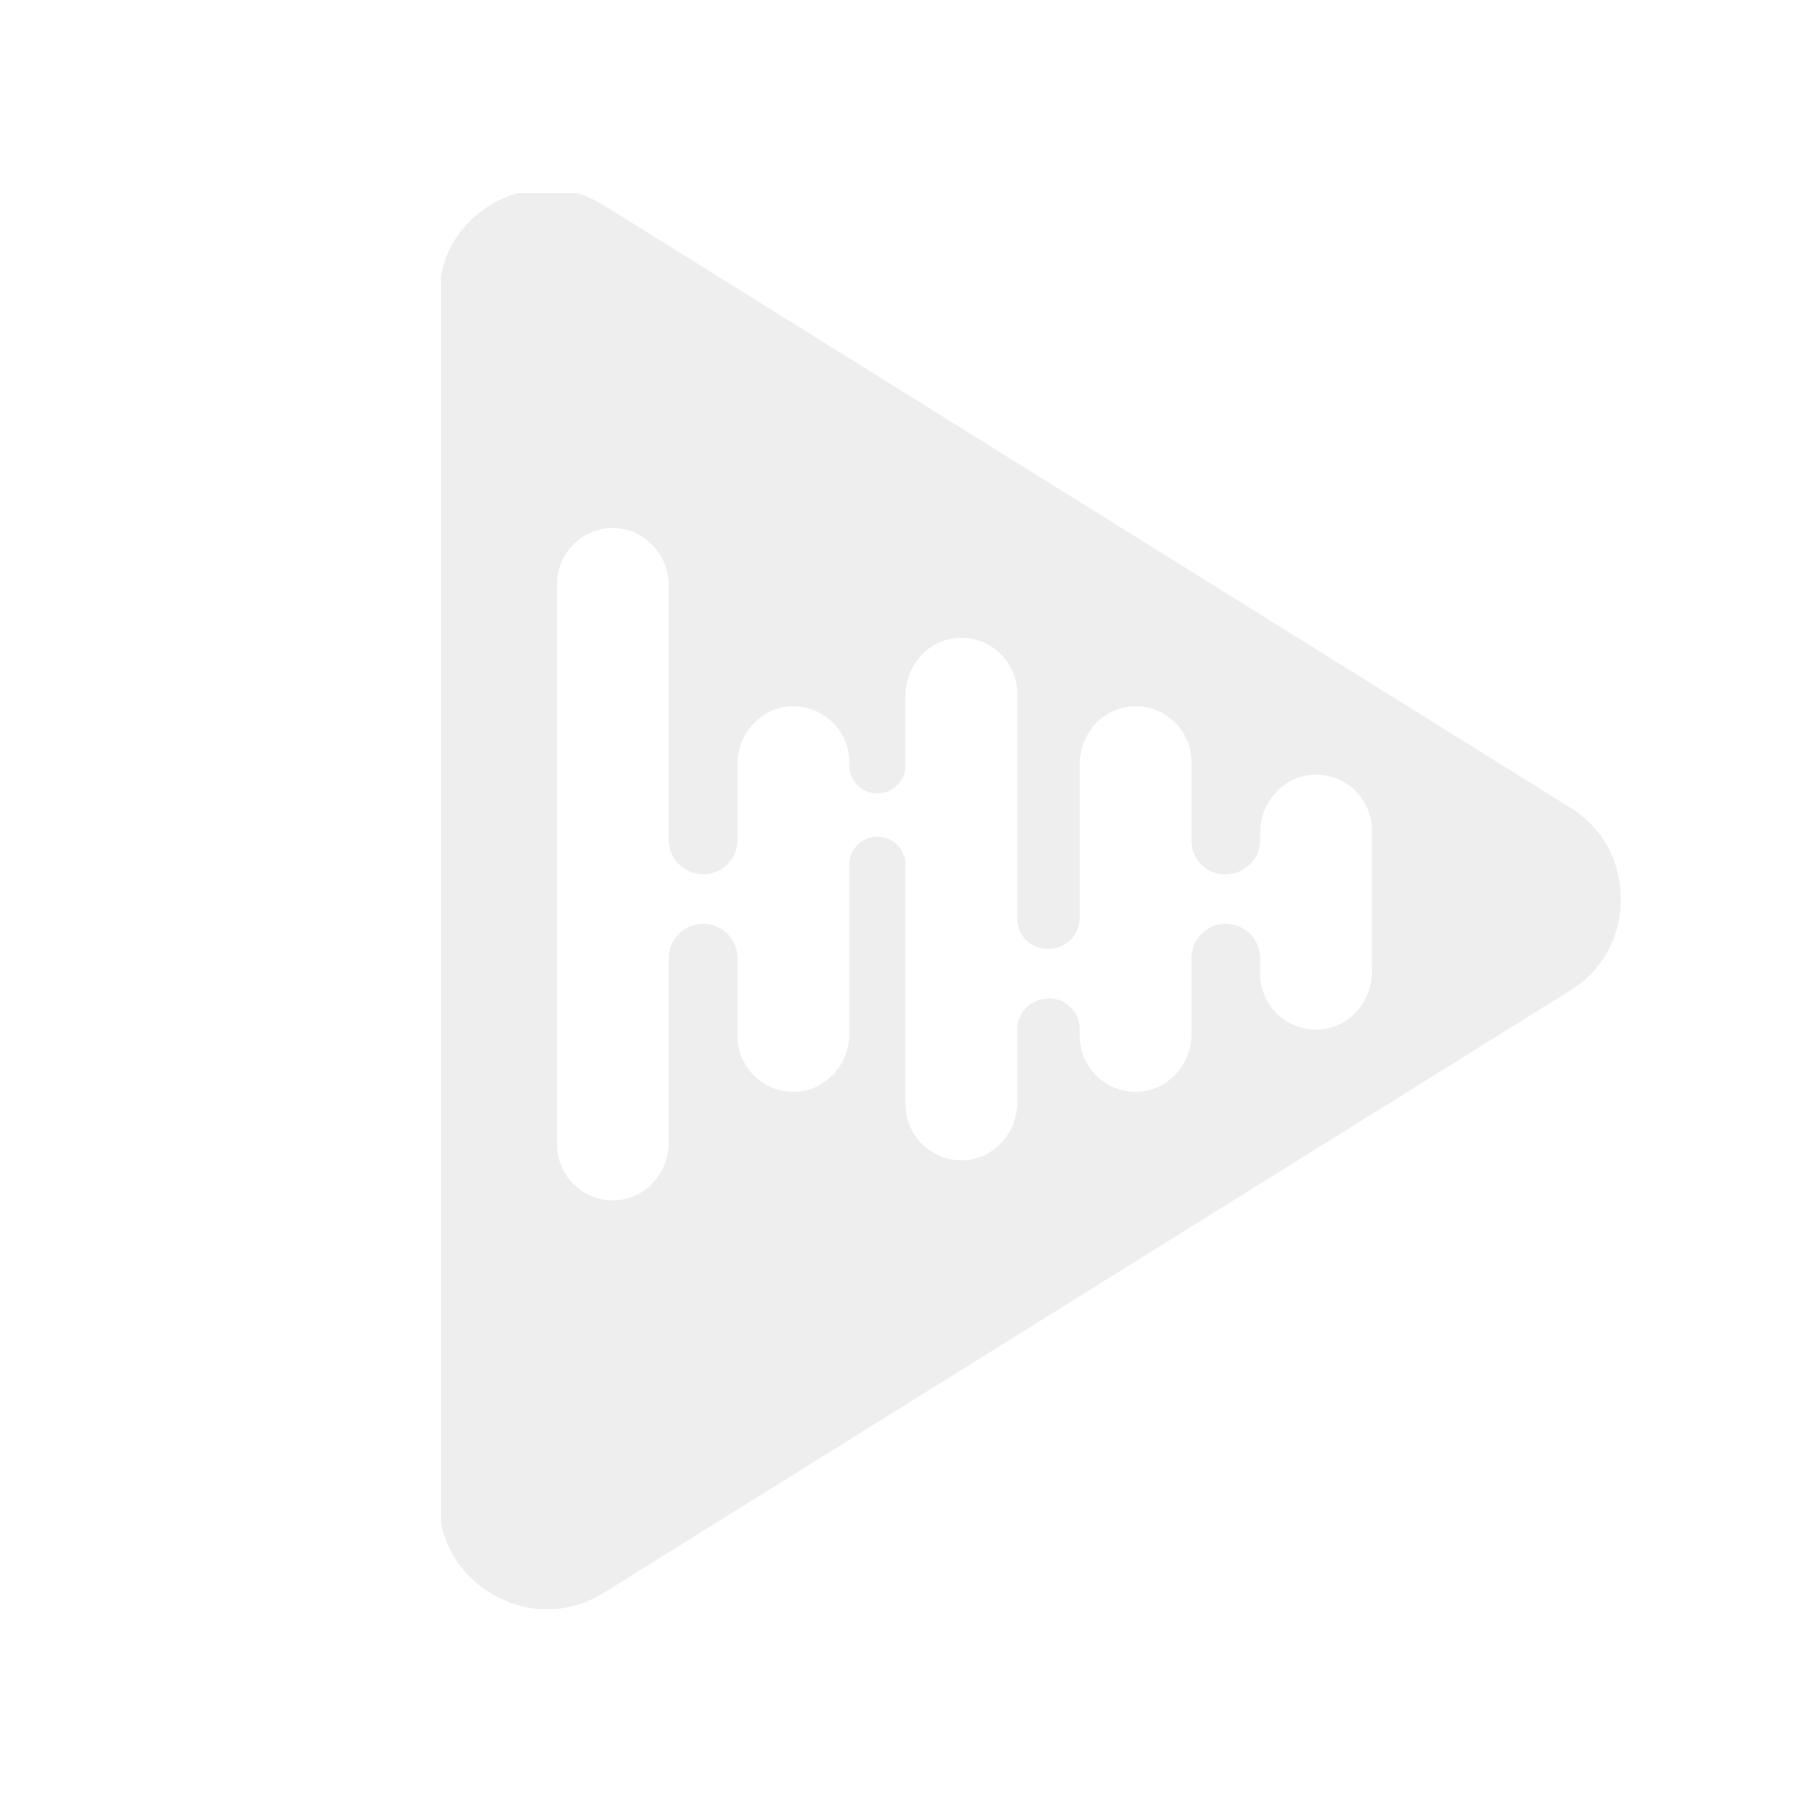 Grandview 148309 Rammespent lerret, kurvet, hvit, 234x132, 16:9, 106